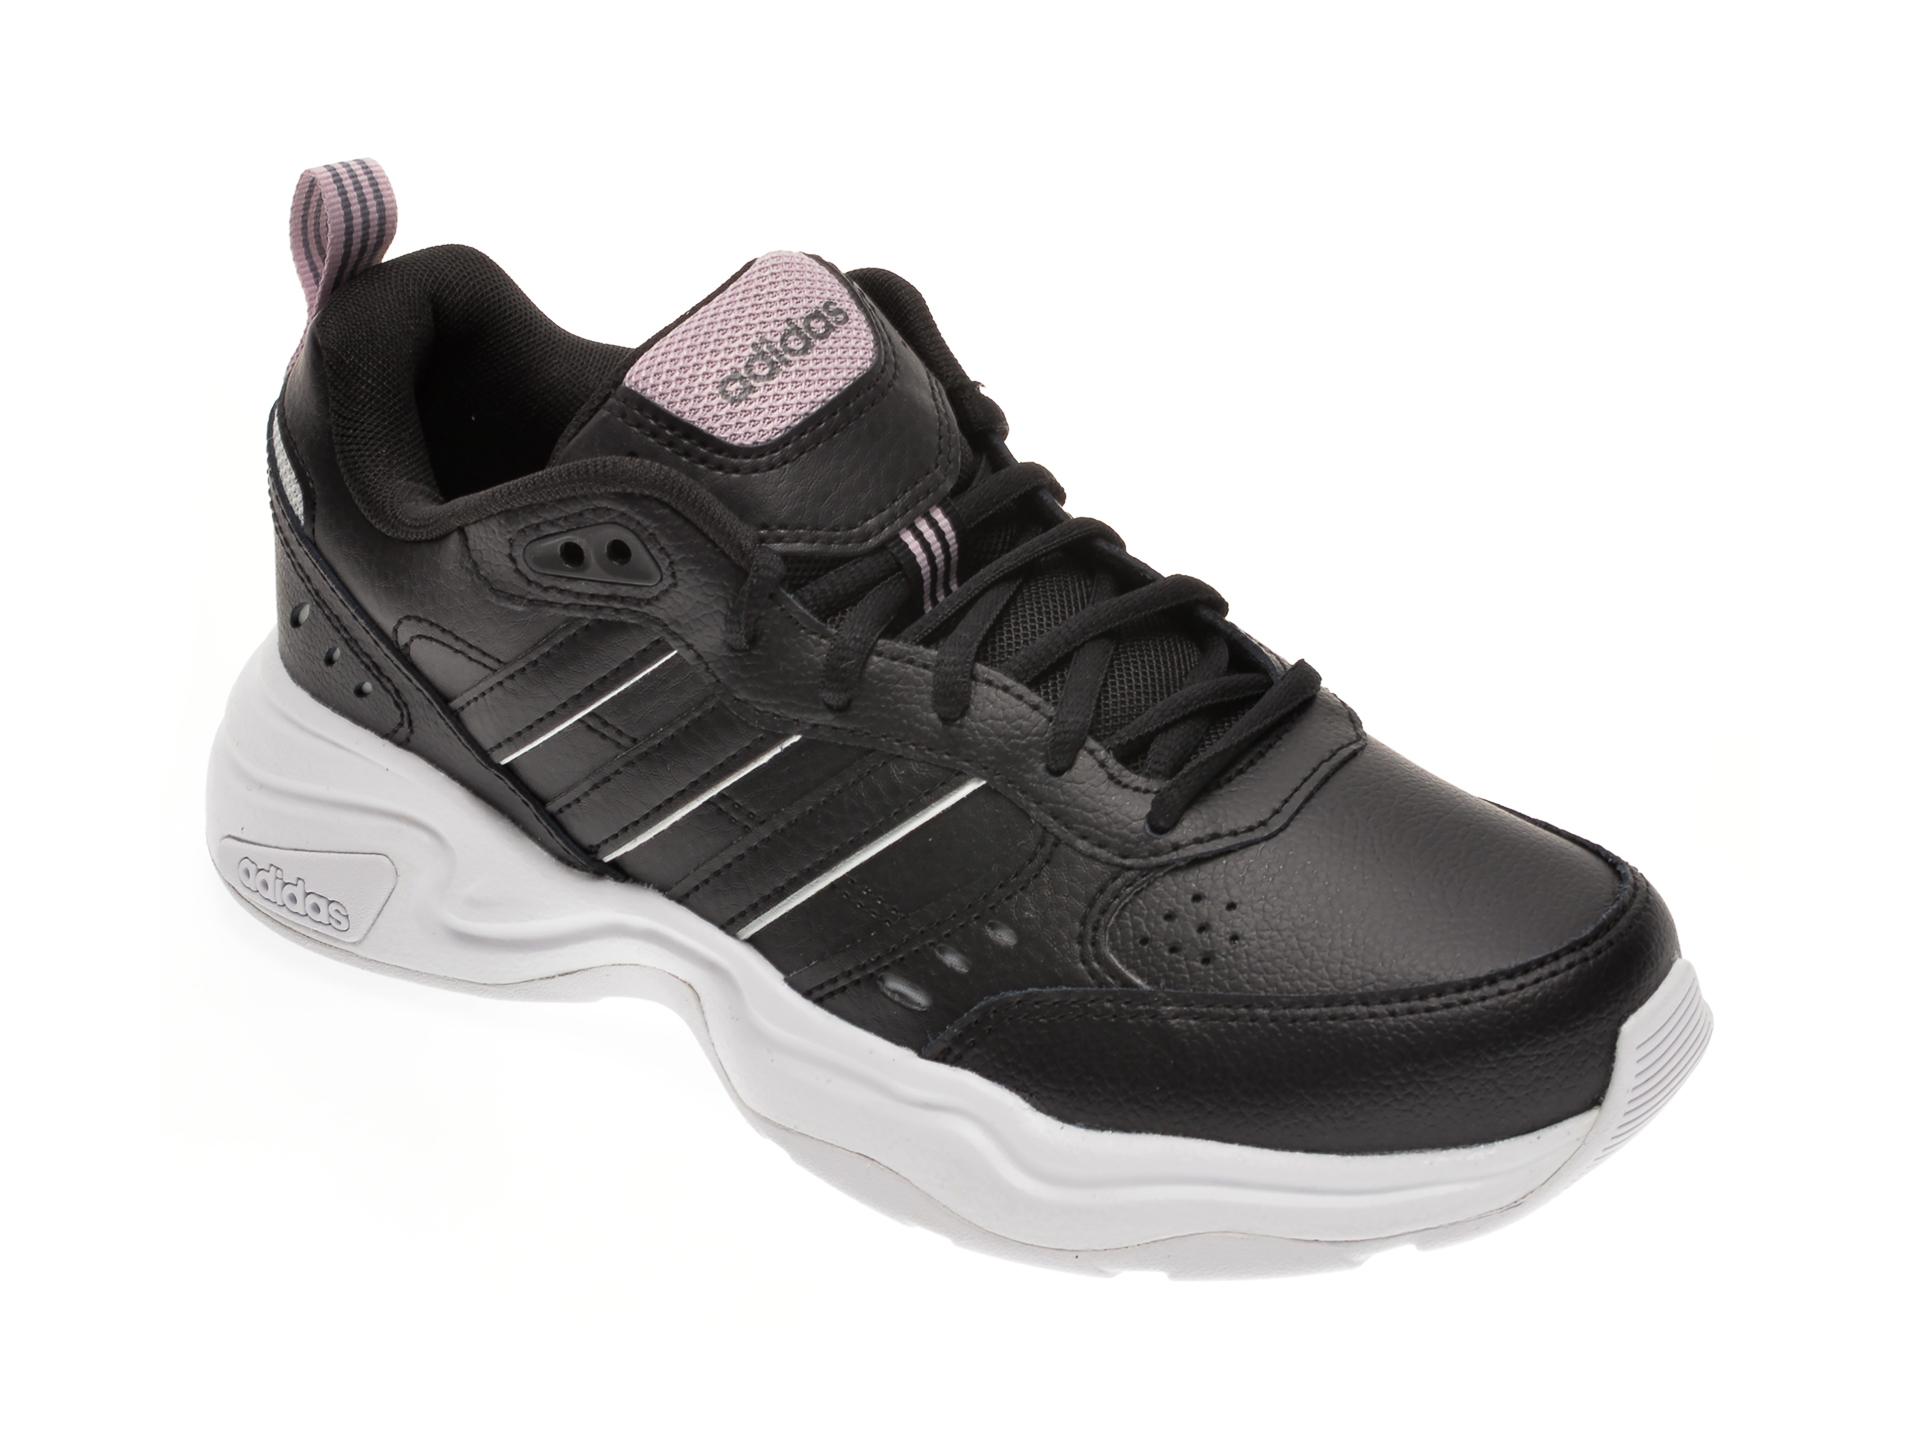 Pantofi sport ADIDAS negri, STRUTTER, din piele naturala